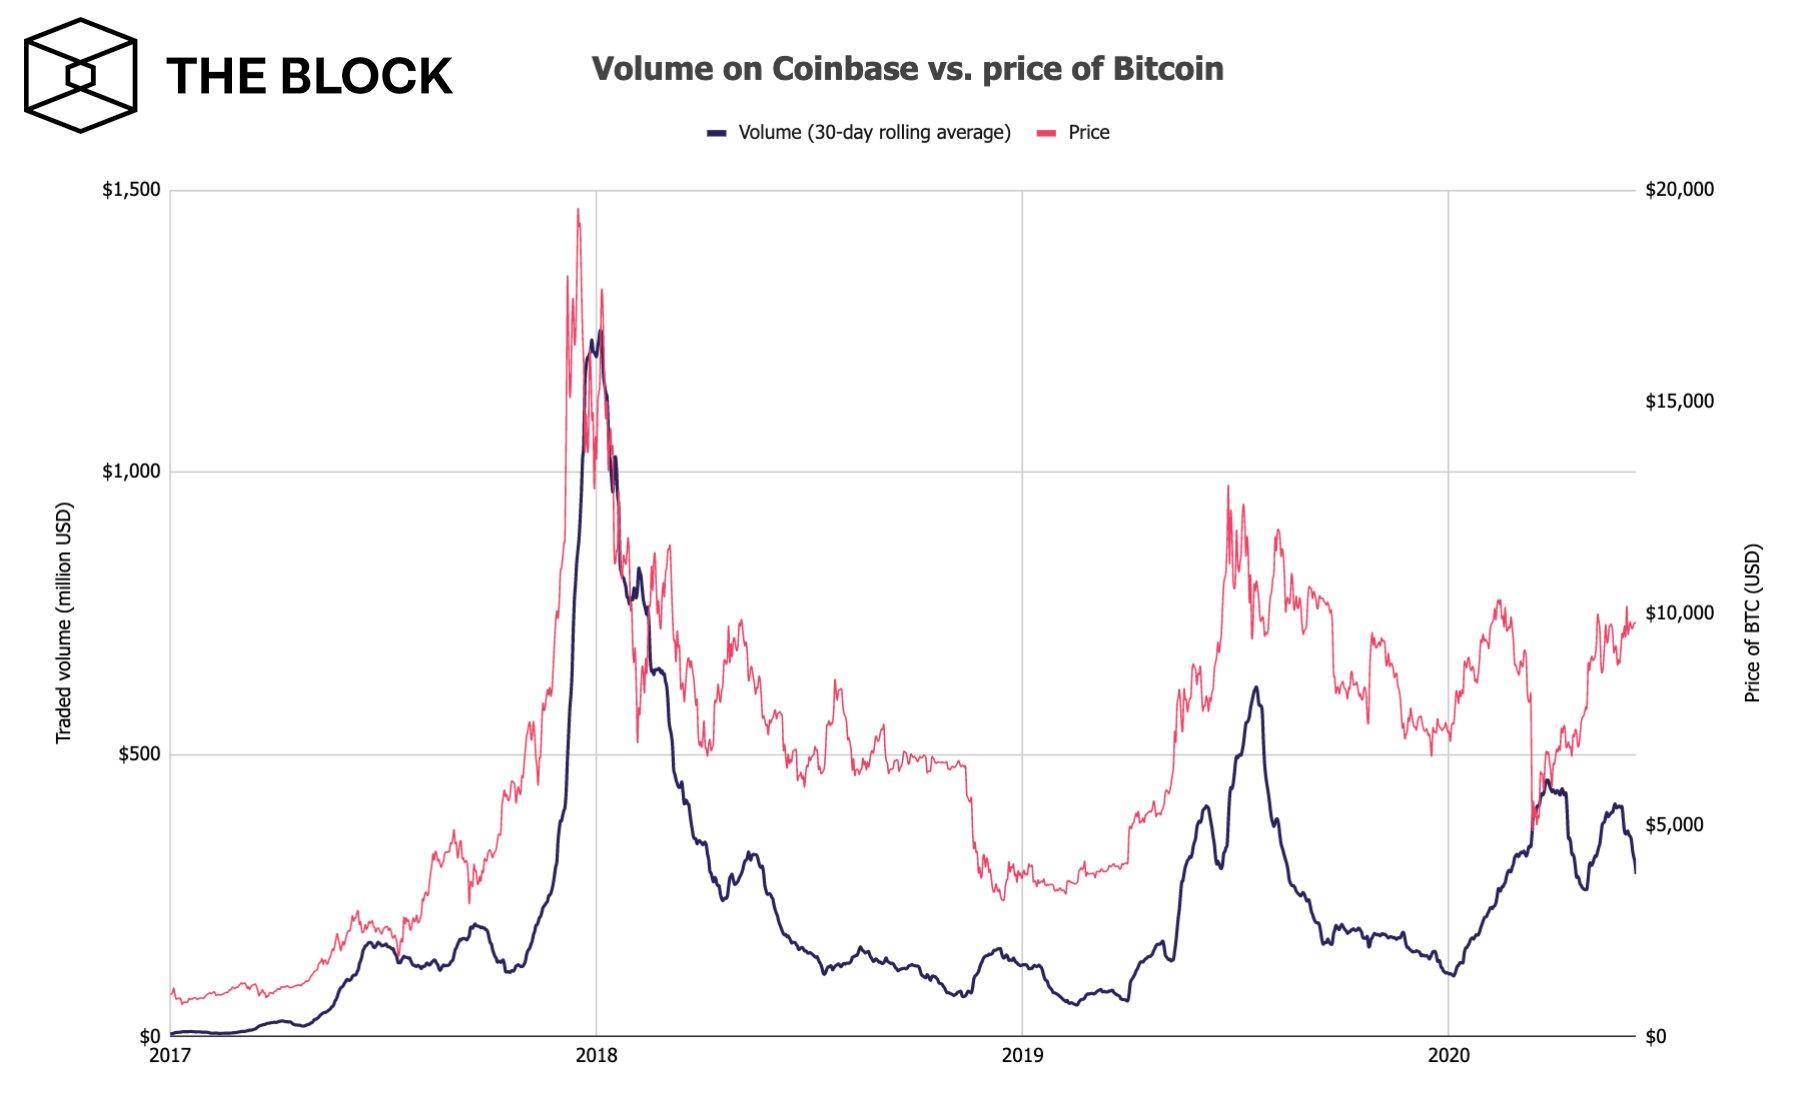 Корреляция bitcoin с объемами торгов на биржах упала до минимума